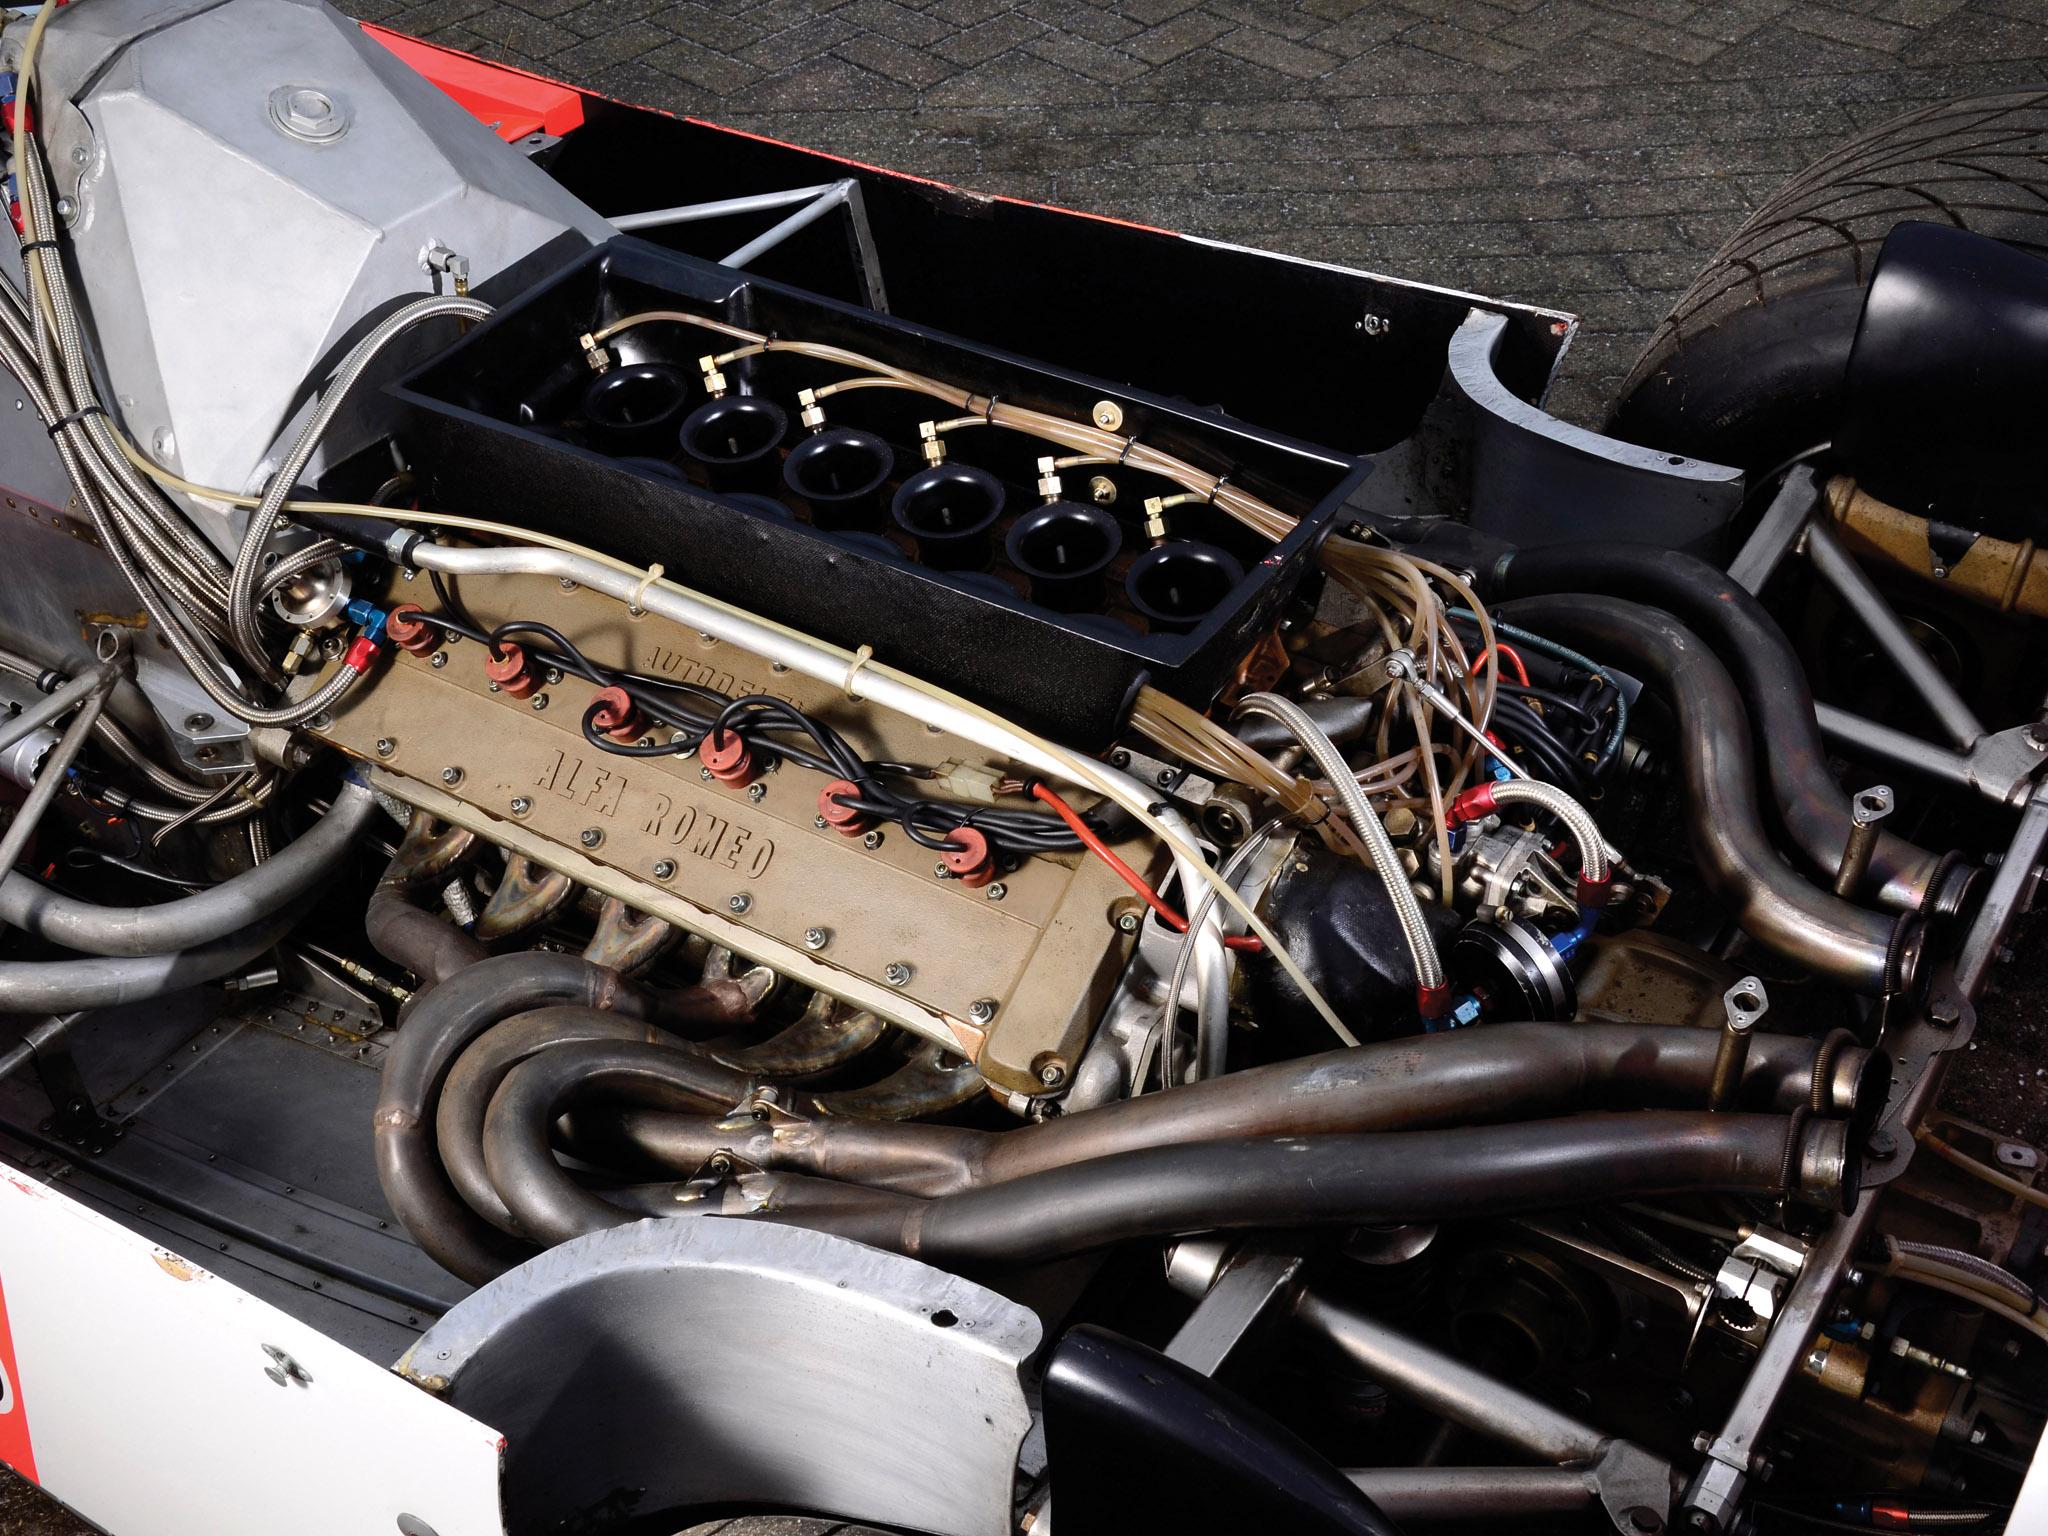 1981 Alfa Romeo V12 179C formula one f-1 race racing classic engine engines d wallpaper ...